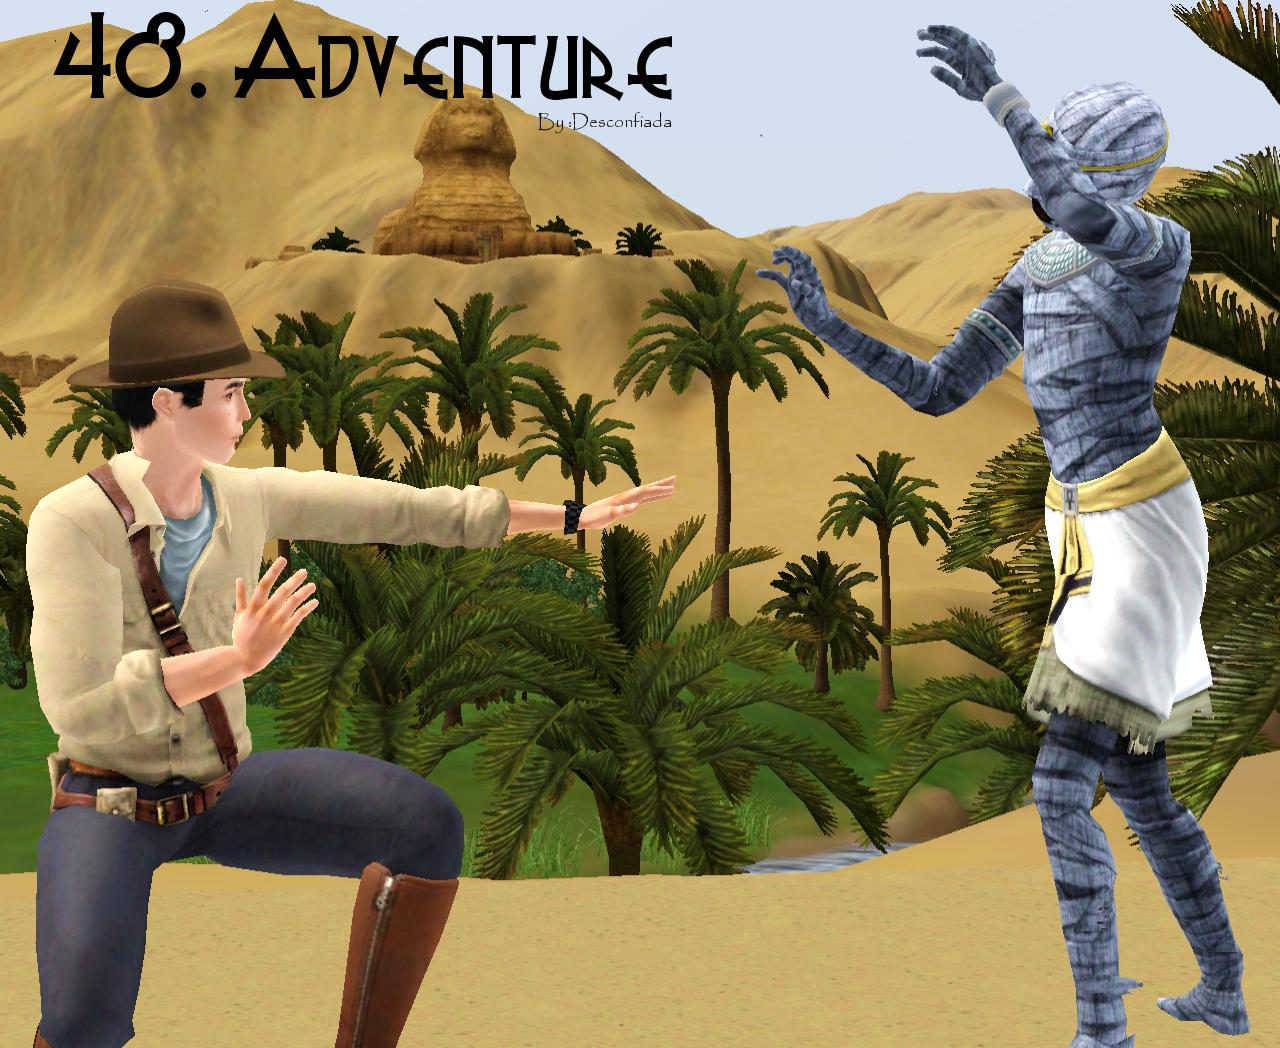 Adventure - 48